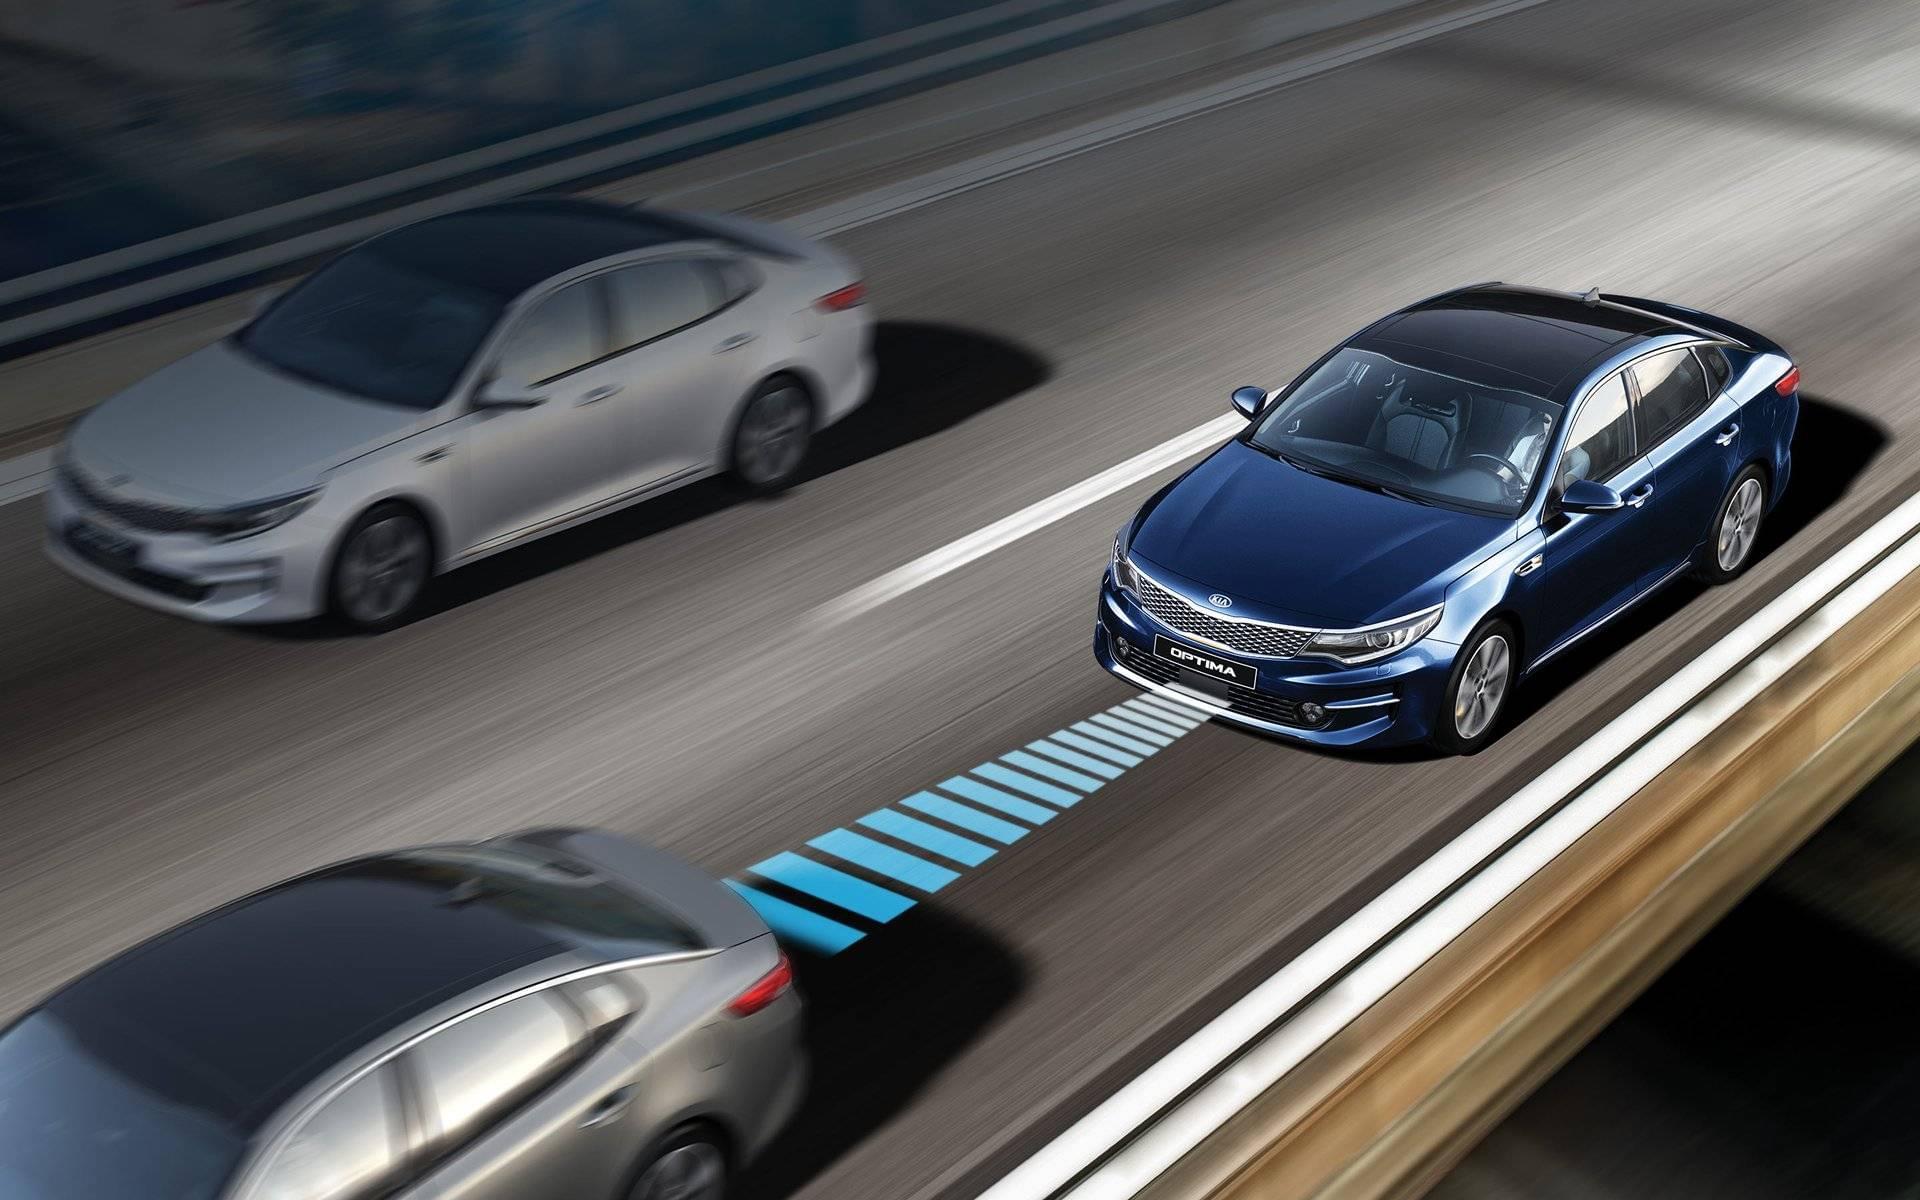 Background Optima 2016 Tech Advanced-smart-cruise-control-kia-1920x-jpg